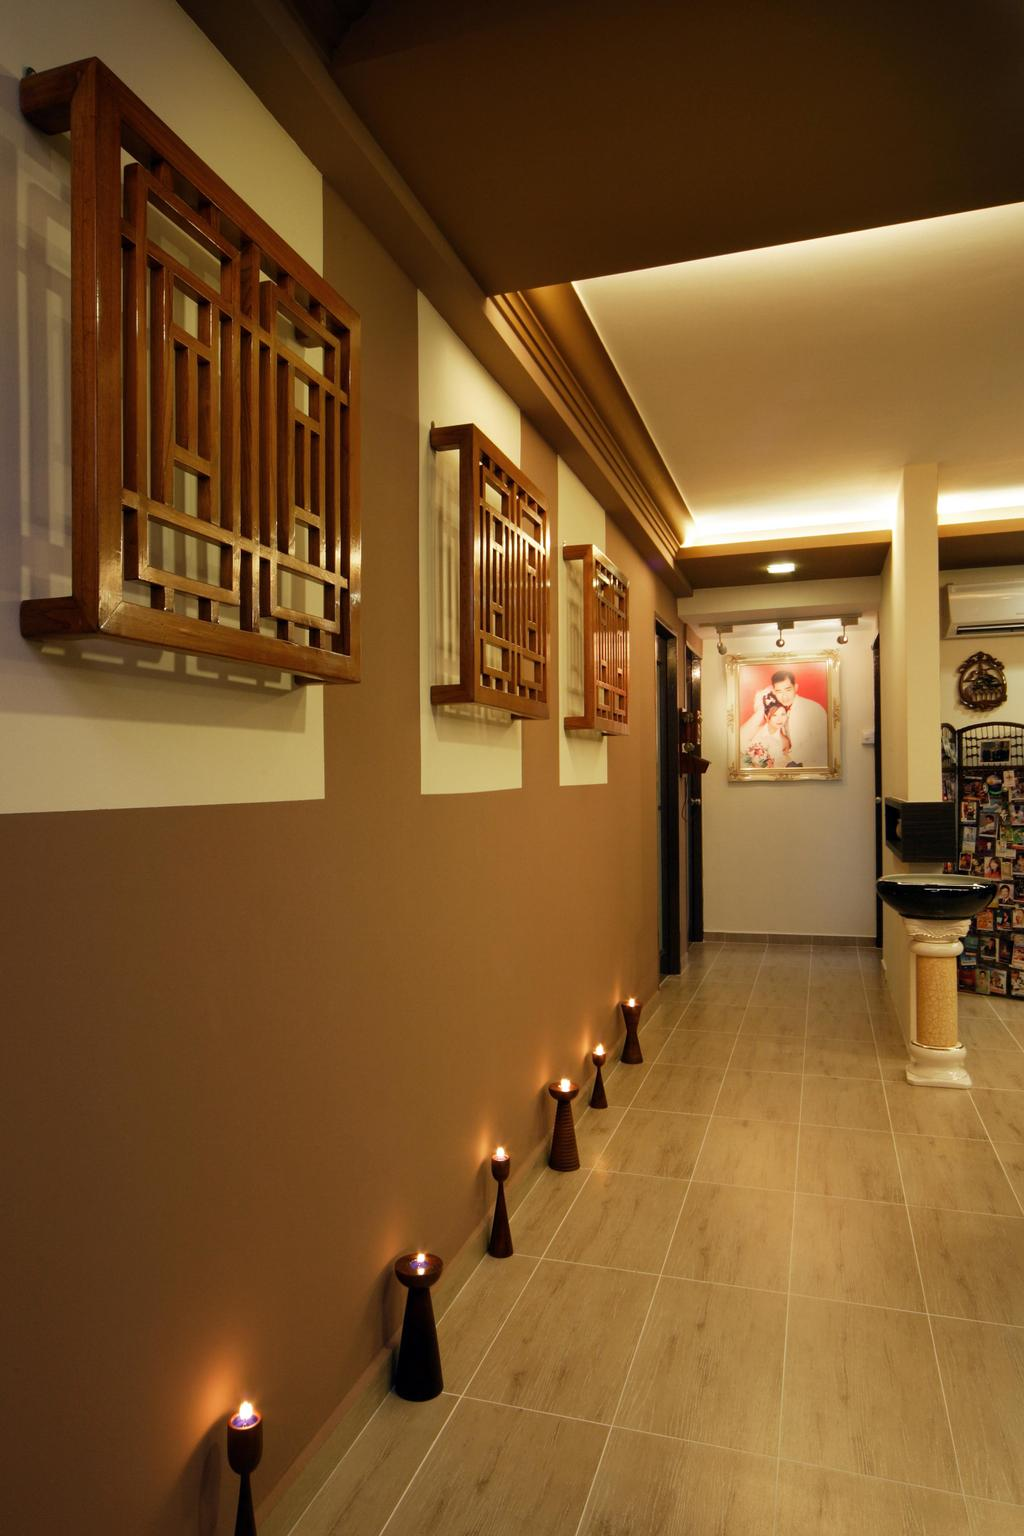 Traditional, HDB, Living Room, Tampines (Block 486A), Interior Designer, Boon Siew D'sign, Lighting, Wall Art, Wood Laminate, Wood, Laminate, White, Brown, Concealed Lighting, False Ceiling, Display Pedastal, Pedastal, Plank Flooring, Warm Tones, Toilet, Art, Art Gallery